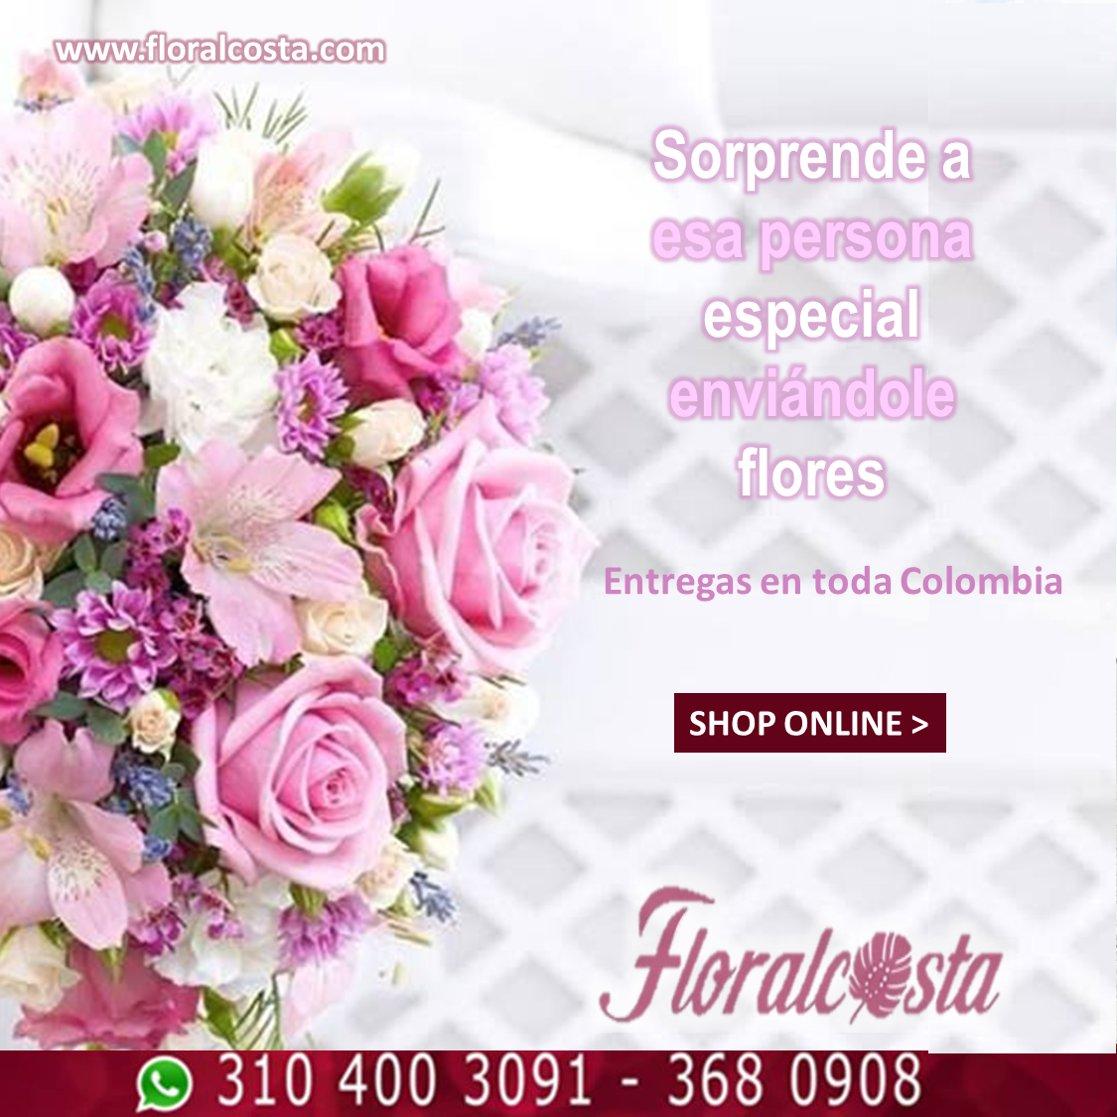 Floralcosta On Twitter No Esperes Una Fecha Especial Para